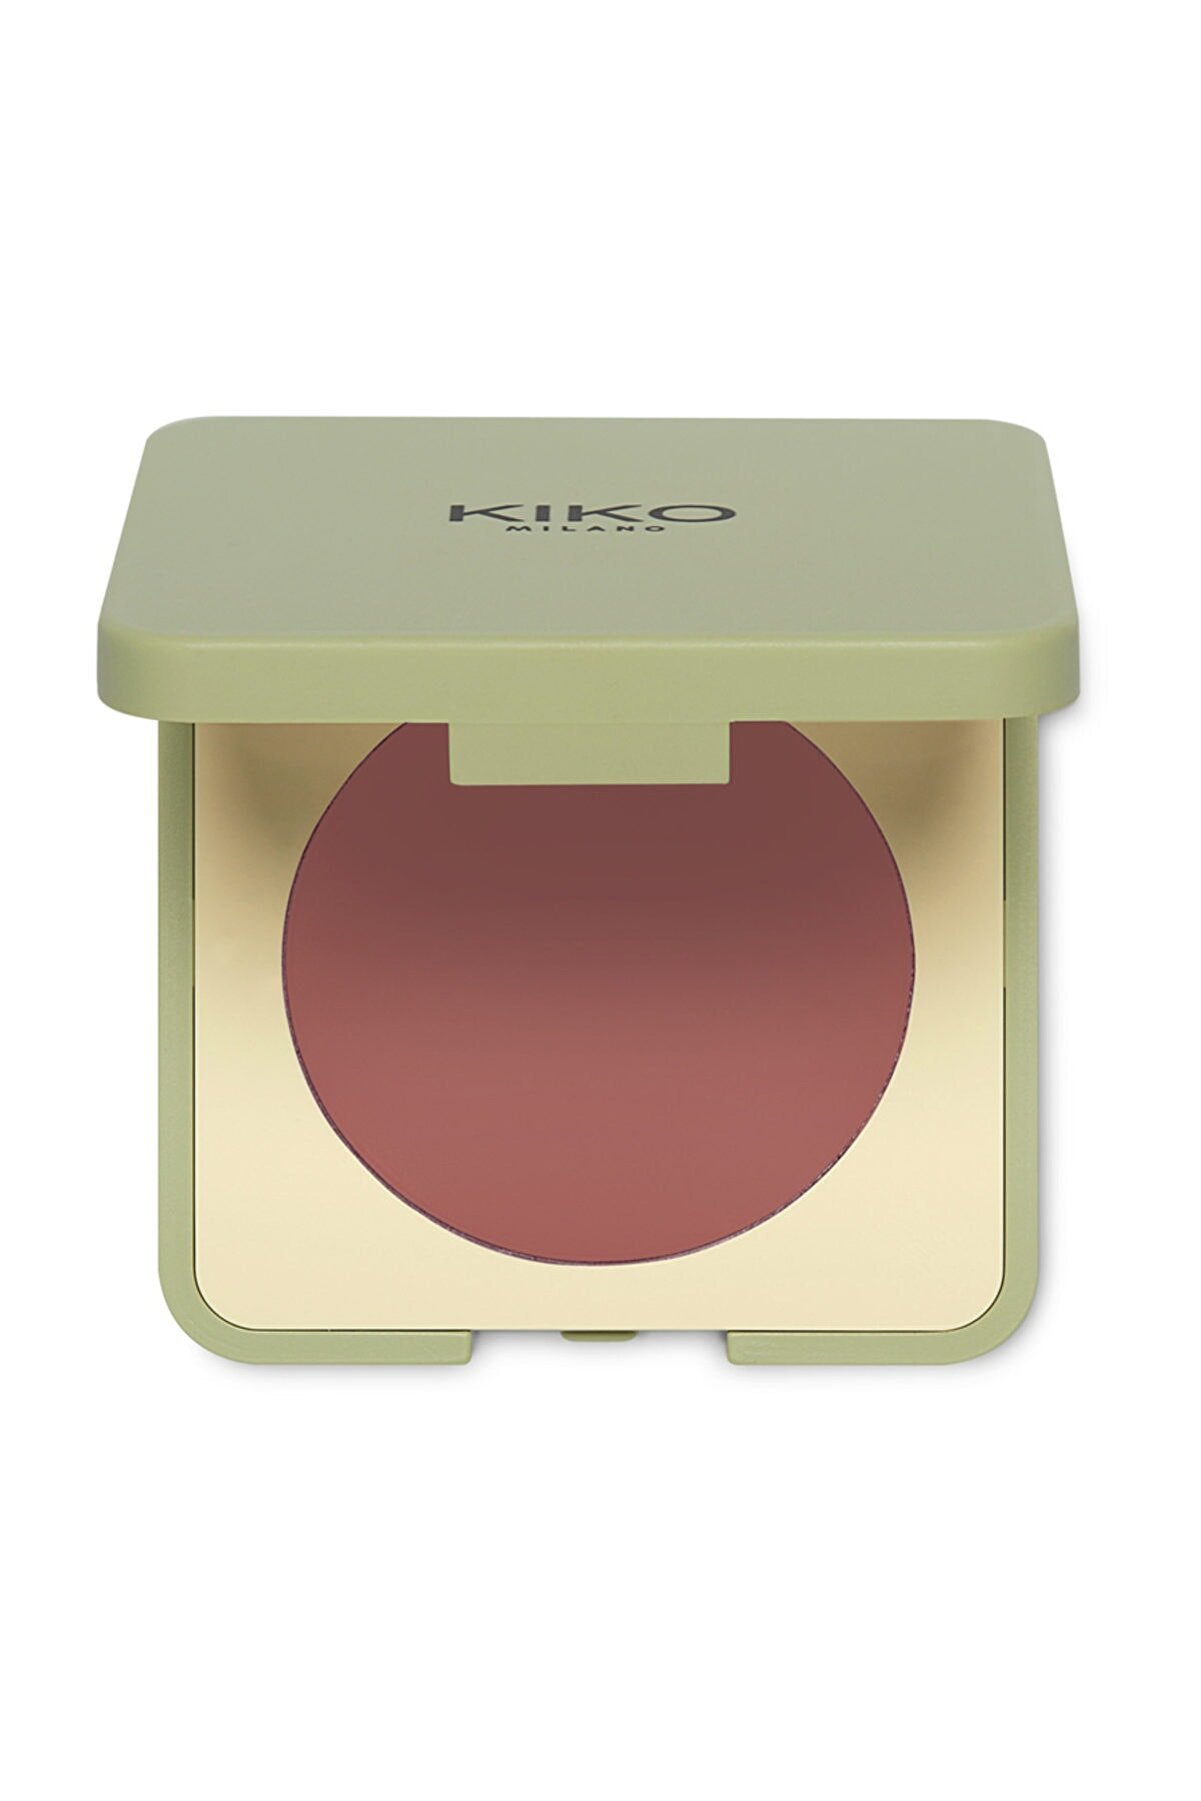 KIKO Kompakt Allık - New Green Me Blush 102 Soft Mauve